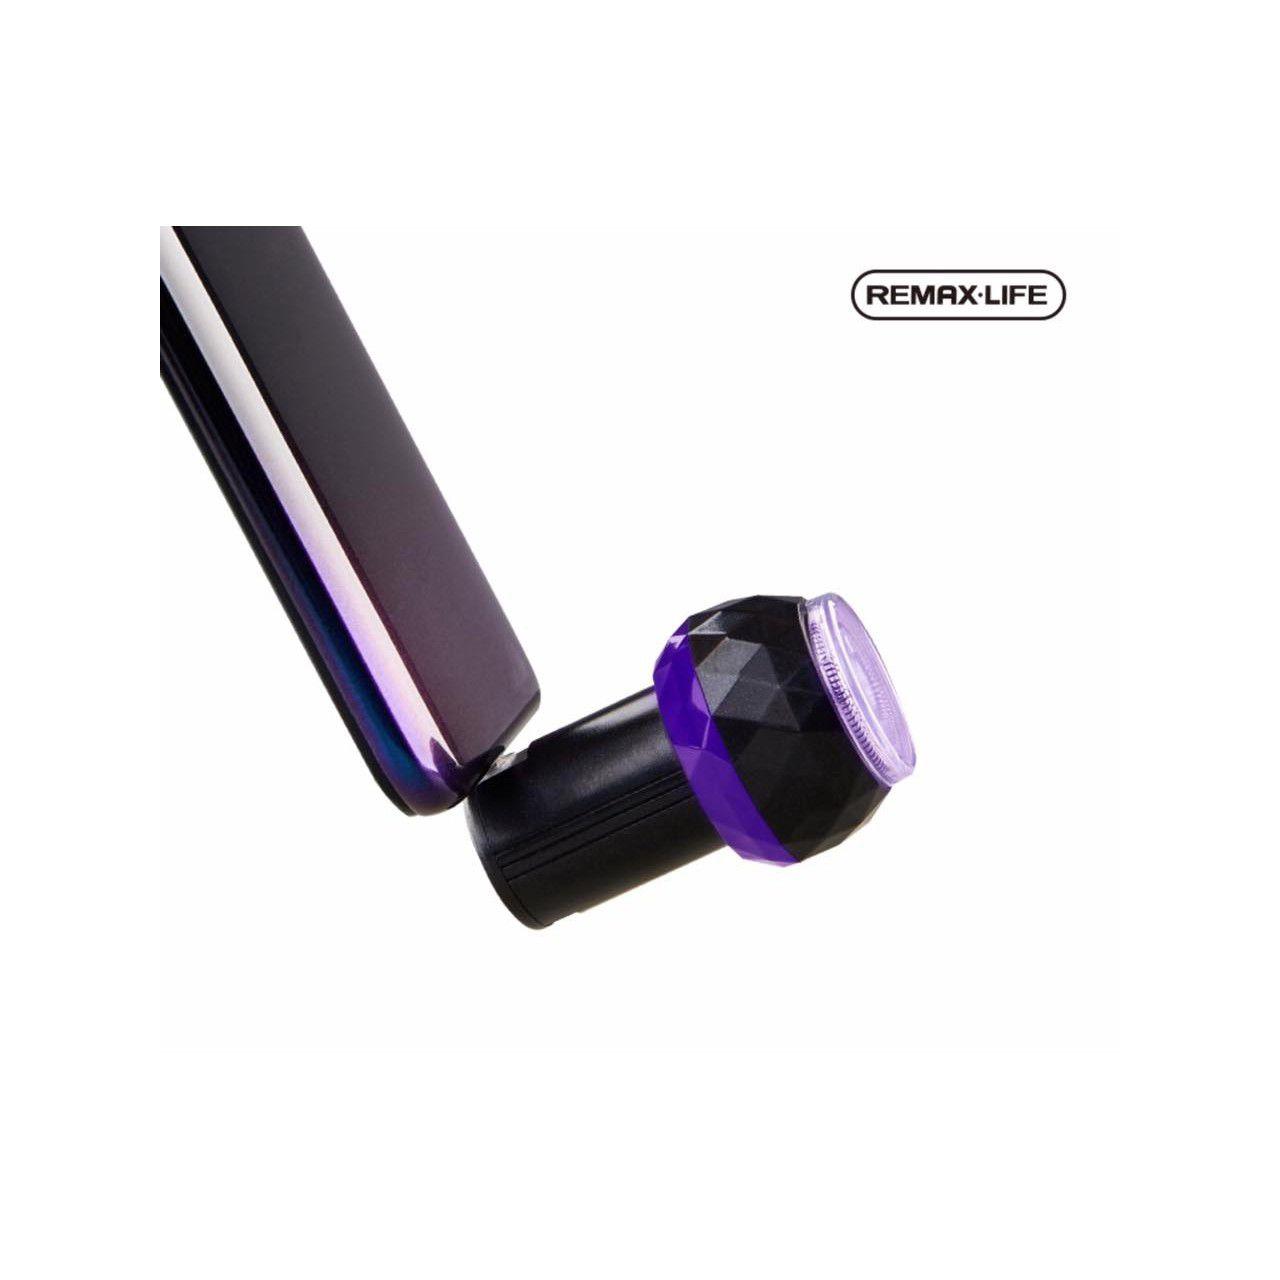 دانگل اصلاح موی صورت ریمکس لایف مدل RL-PC02 Micro -  - 3